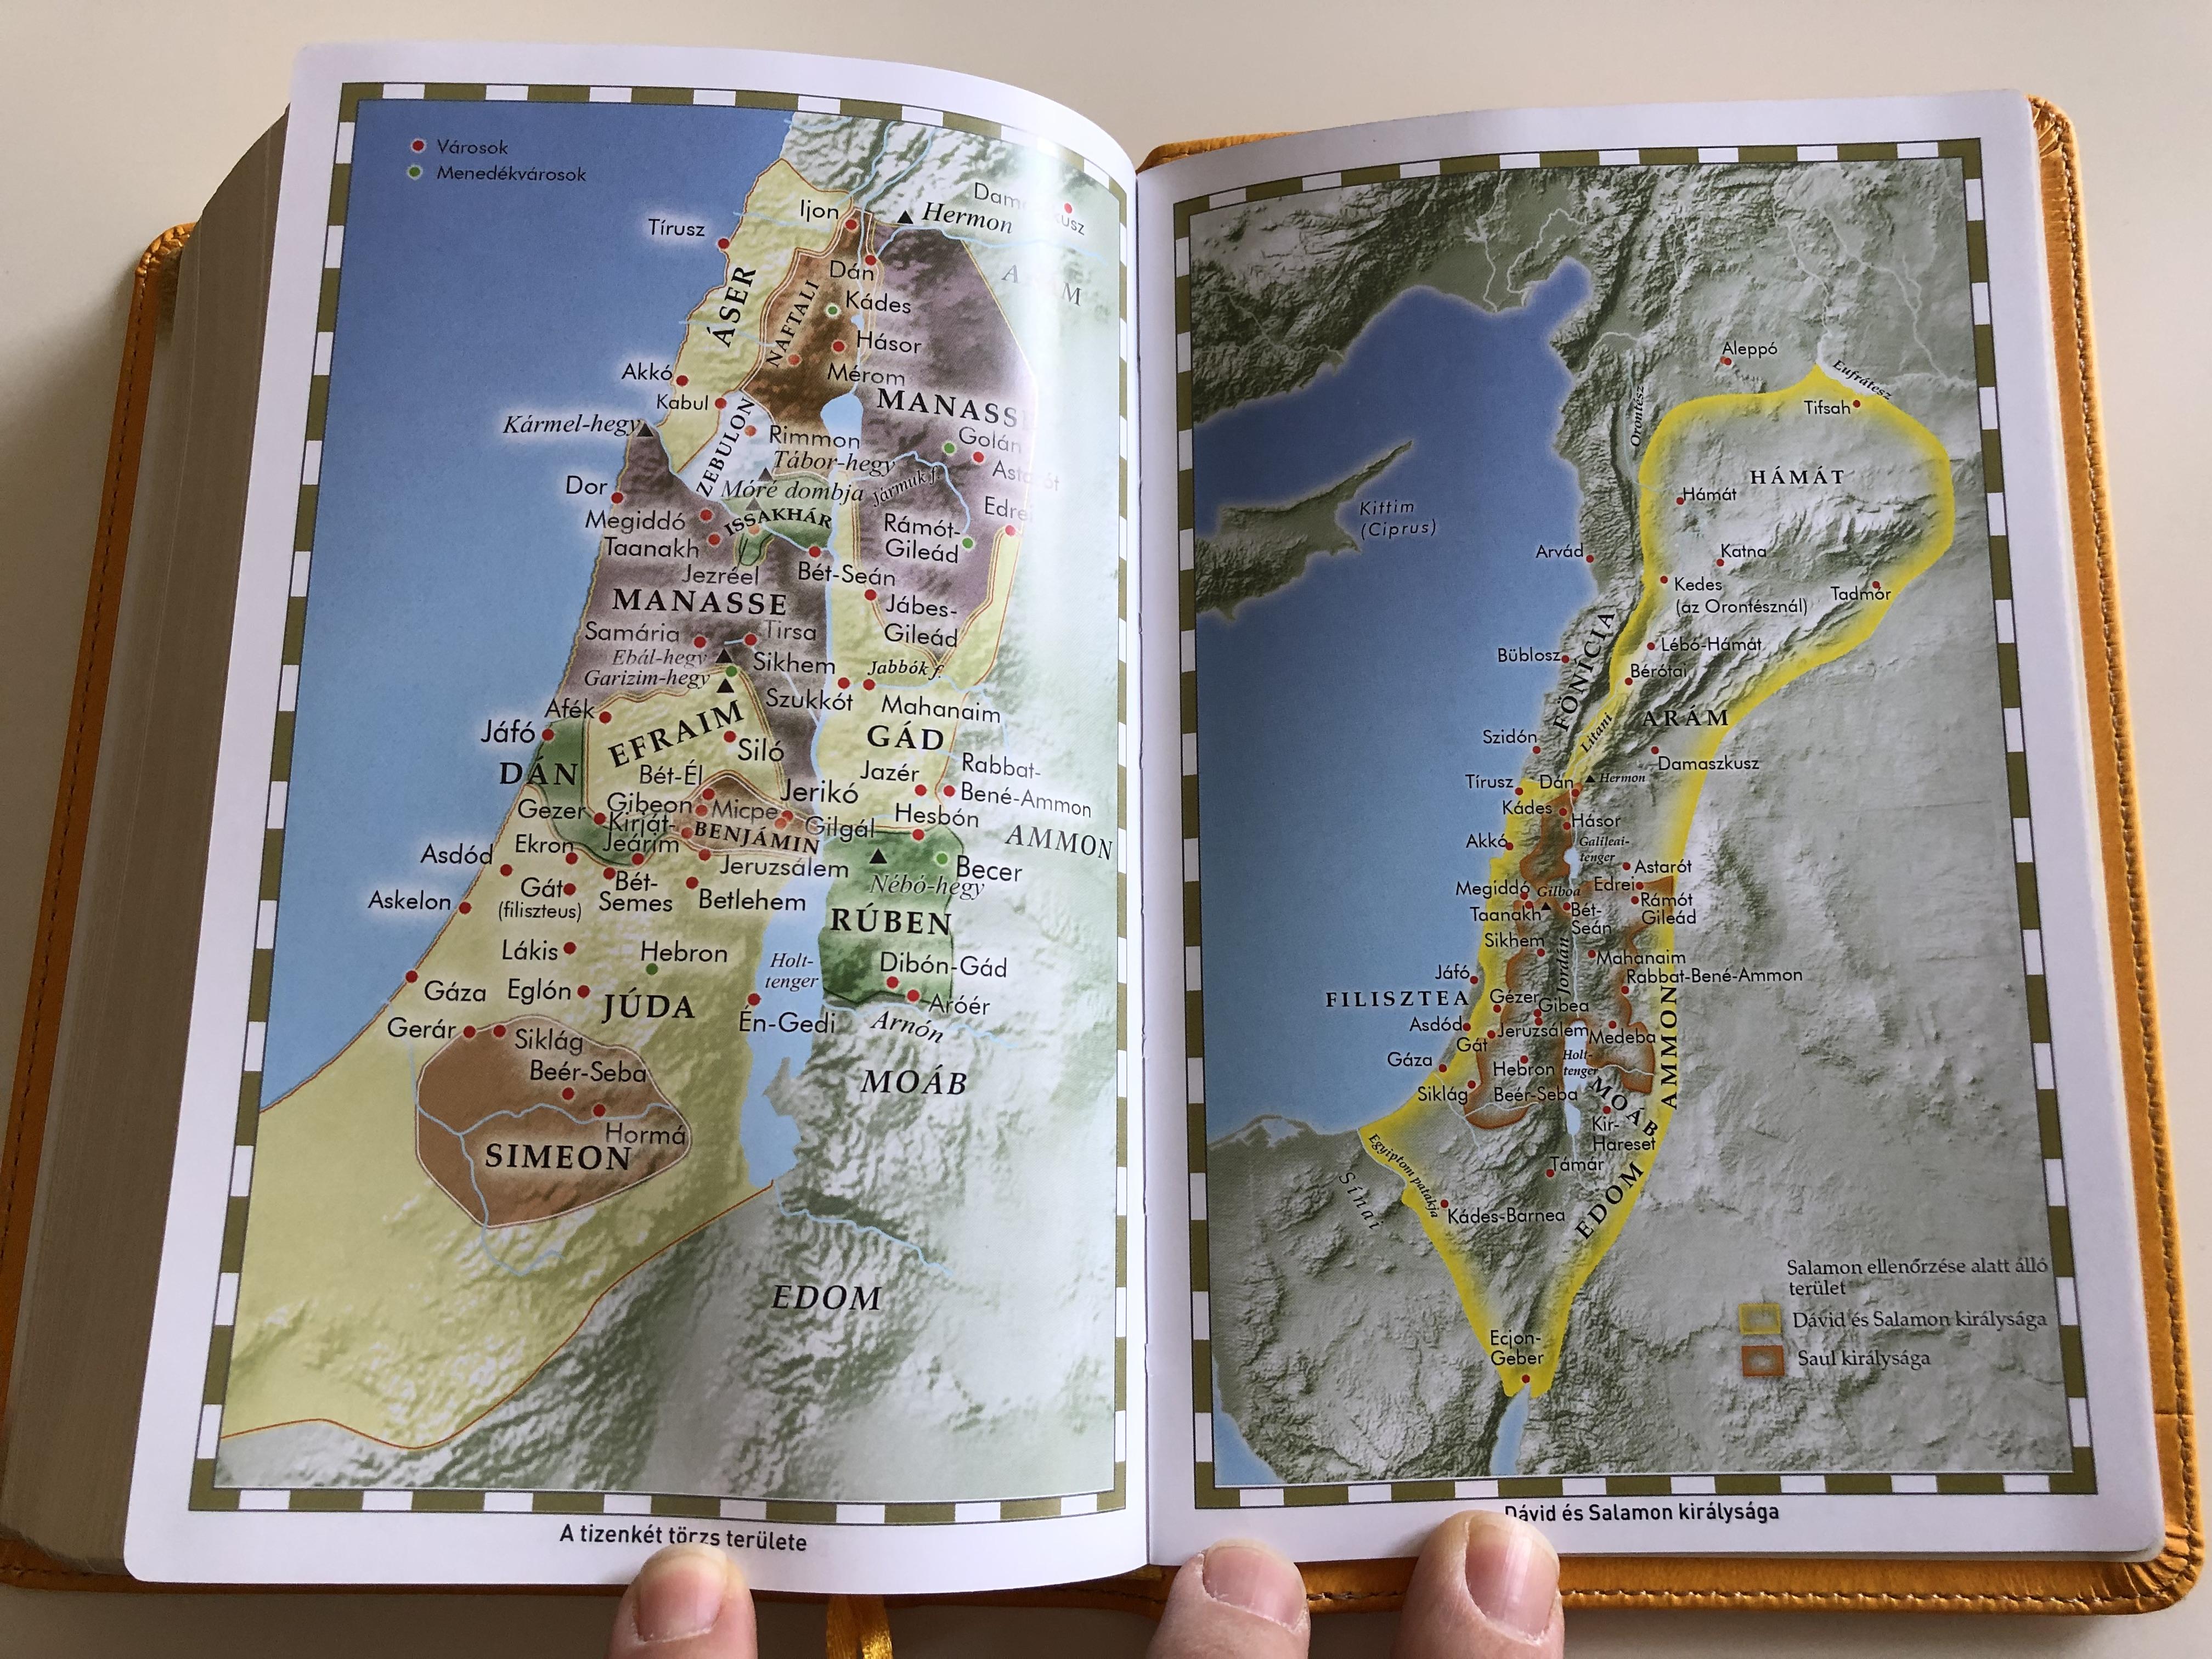 holy-bible-szent-biblia-k-roli-g-sp-r-sun-yellow-leather-bound-naps-rga-b-rk-t-s-golden-edges-words-of-christ-in-red-maps-timeline-j-zus-szavai-piros-kiemel-ssel-t-rk-pek-s-id-vonal-17-.jpg